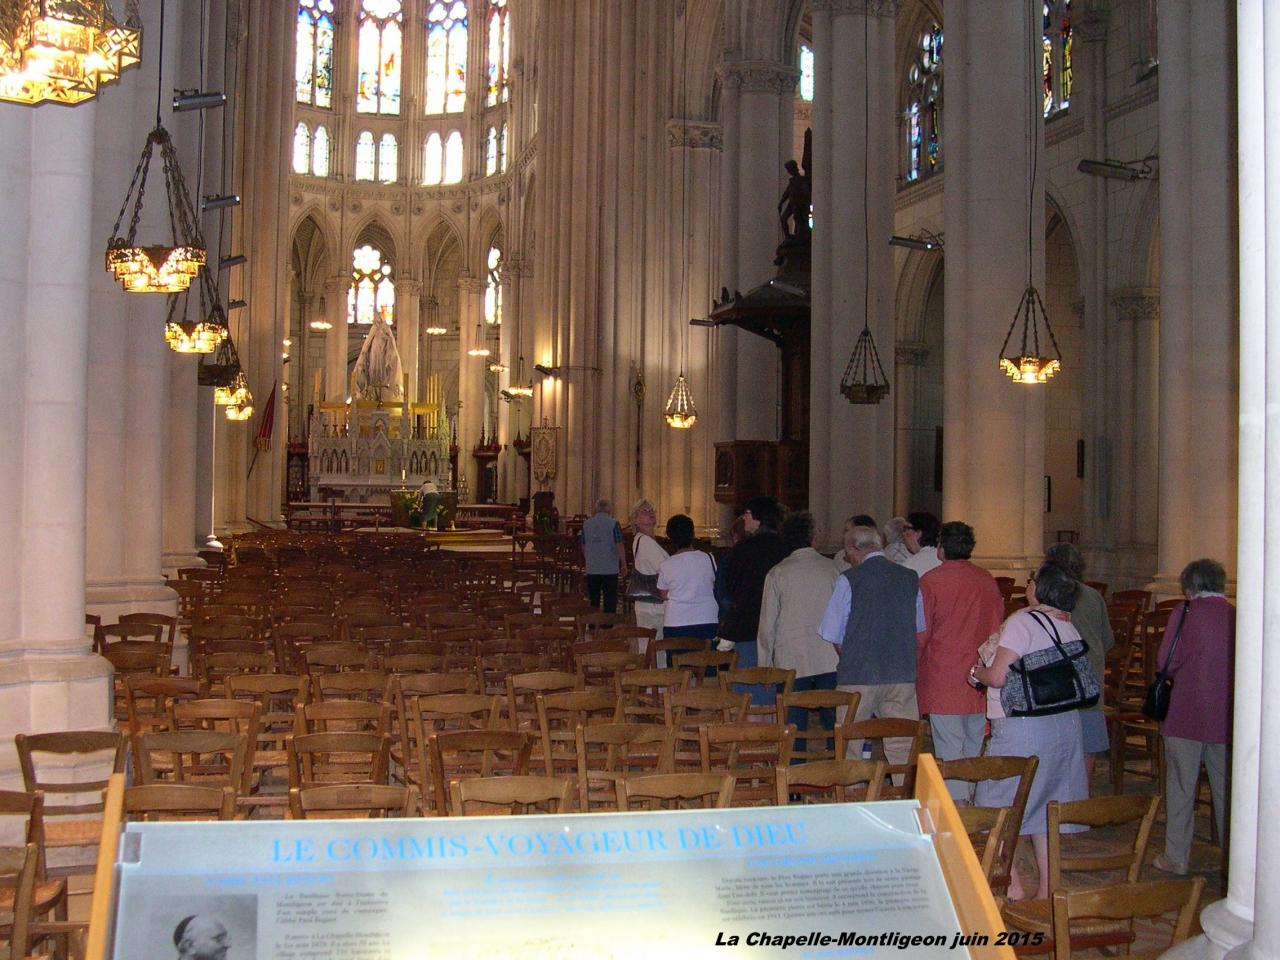 17-La Chapelle-Montligeon